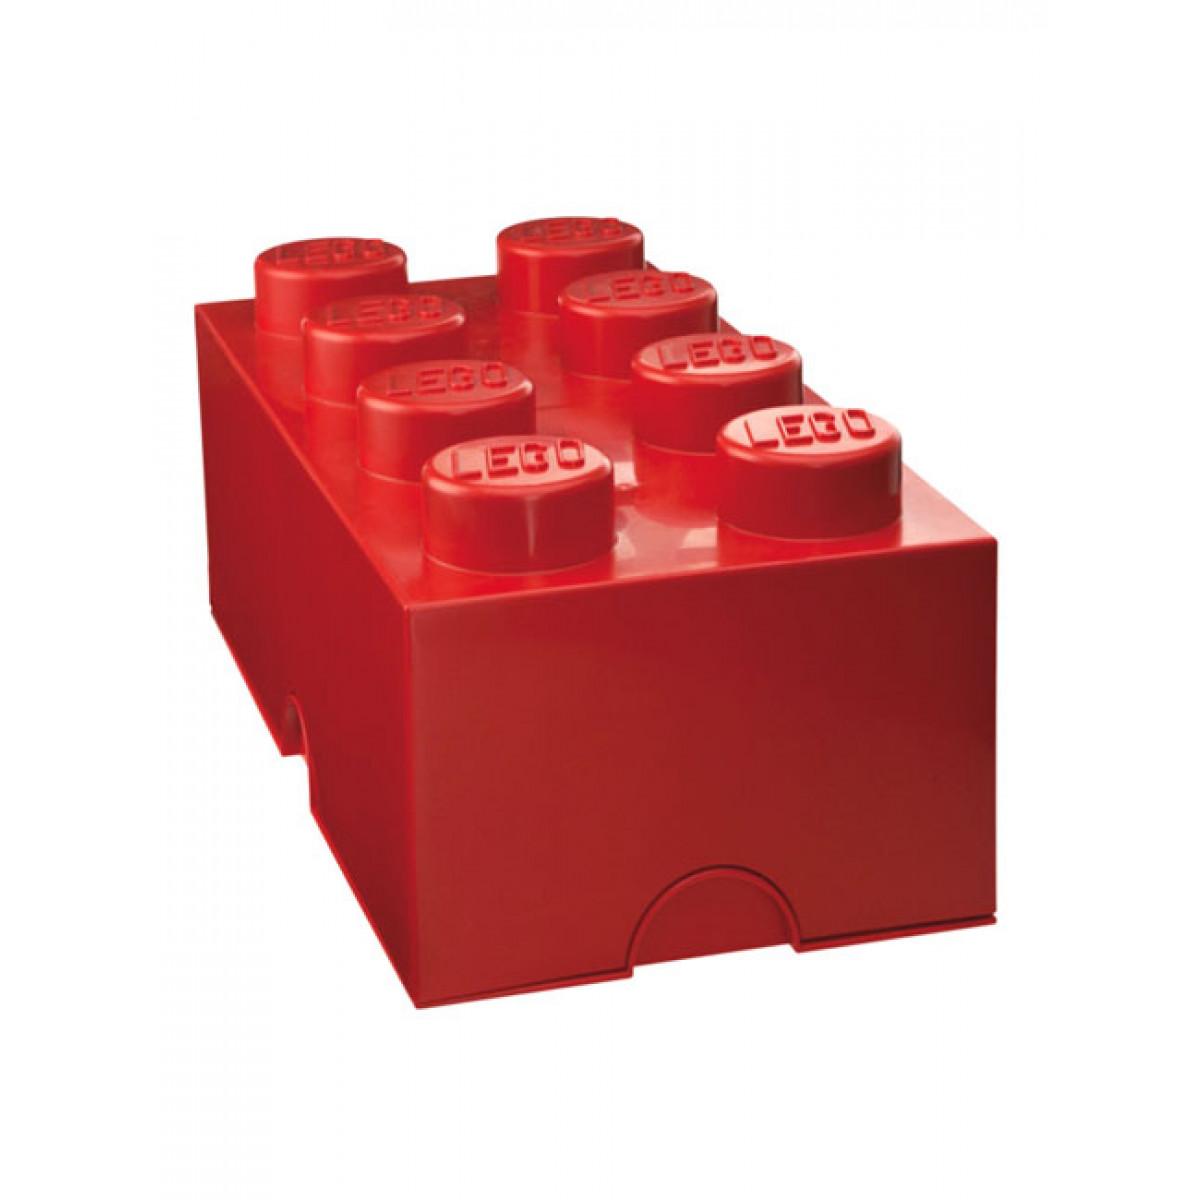 Lego Storage Brick Box 8 More Colours Available